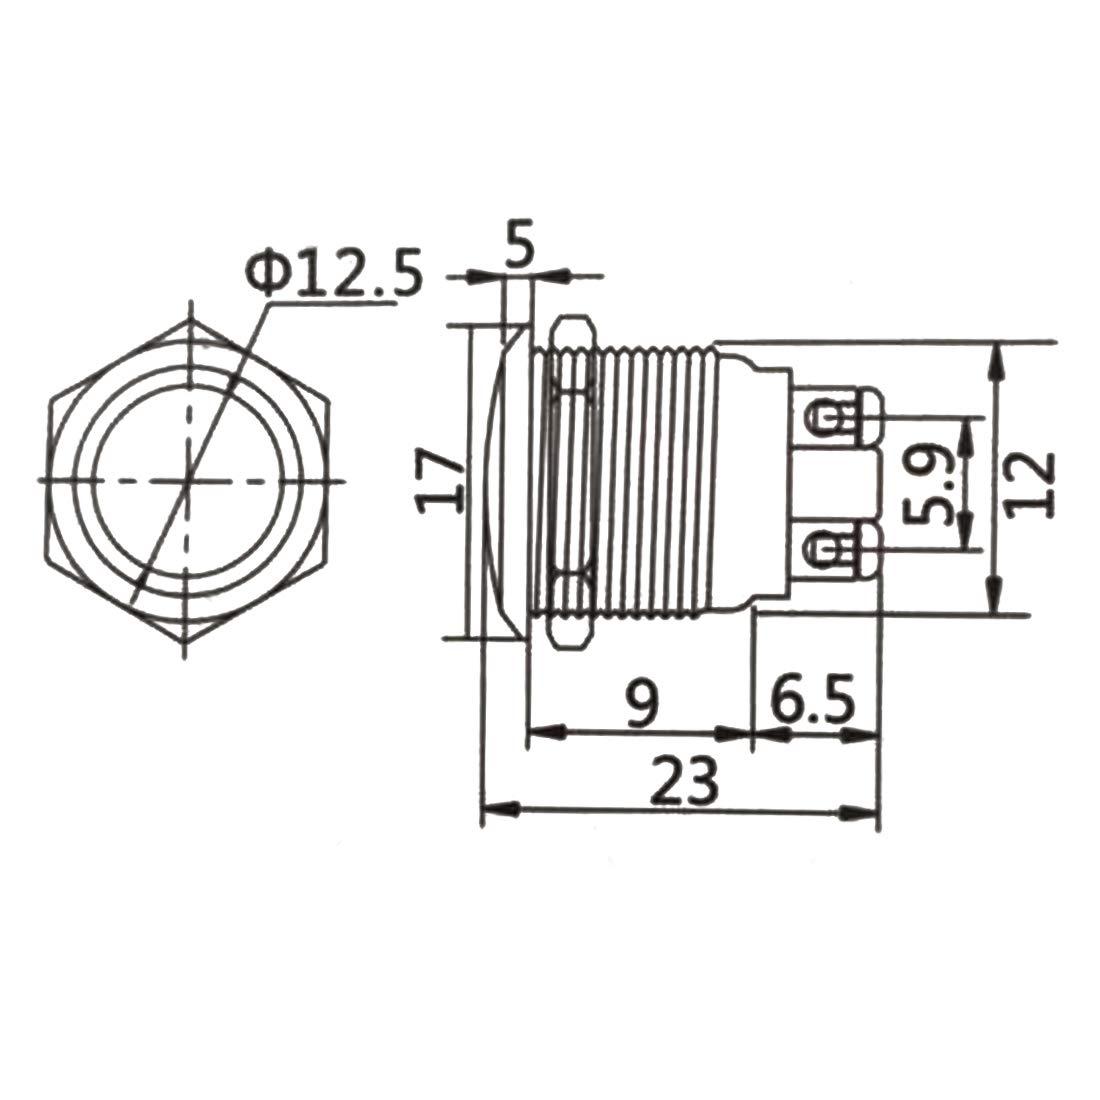 Larcele 12mm Bot/ón Impermeable Mini Metal Actualmente Pulsar Pulsador con Tornillo,10 Piezas jsankg-13,Rojo